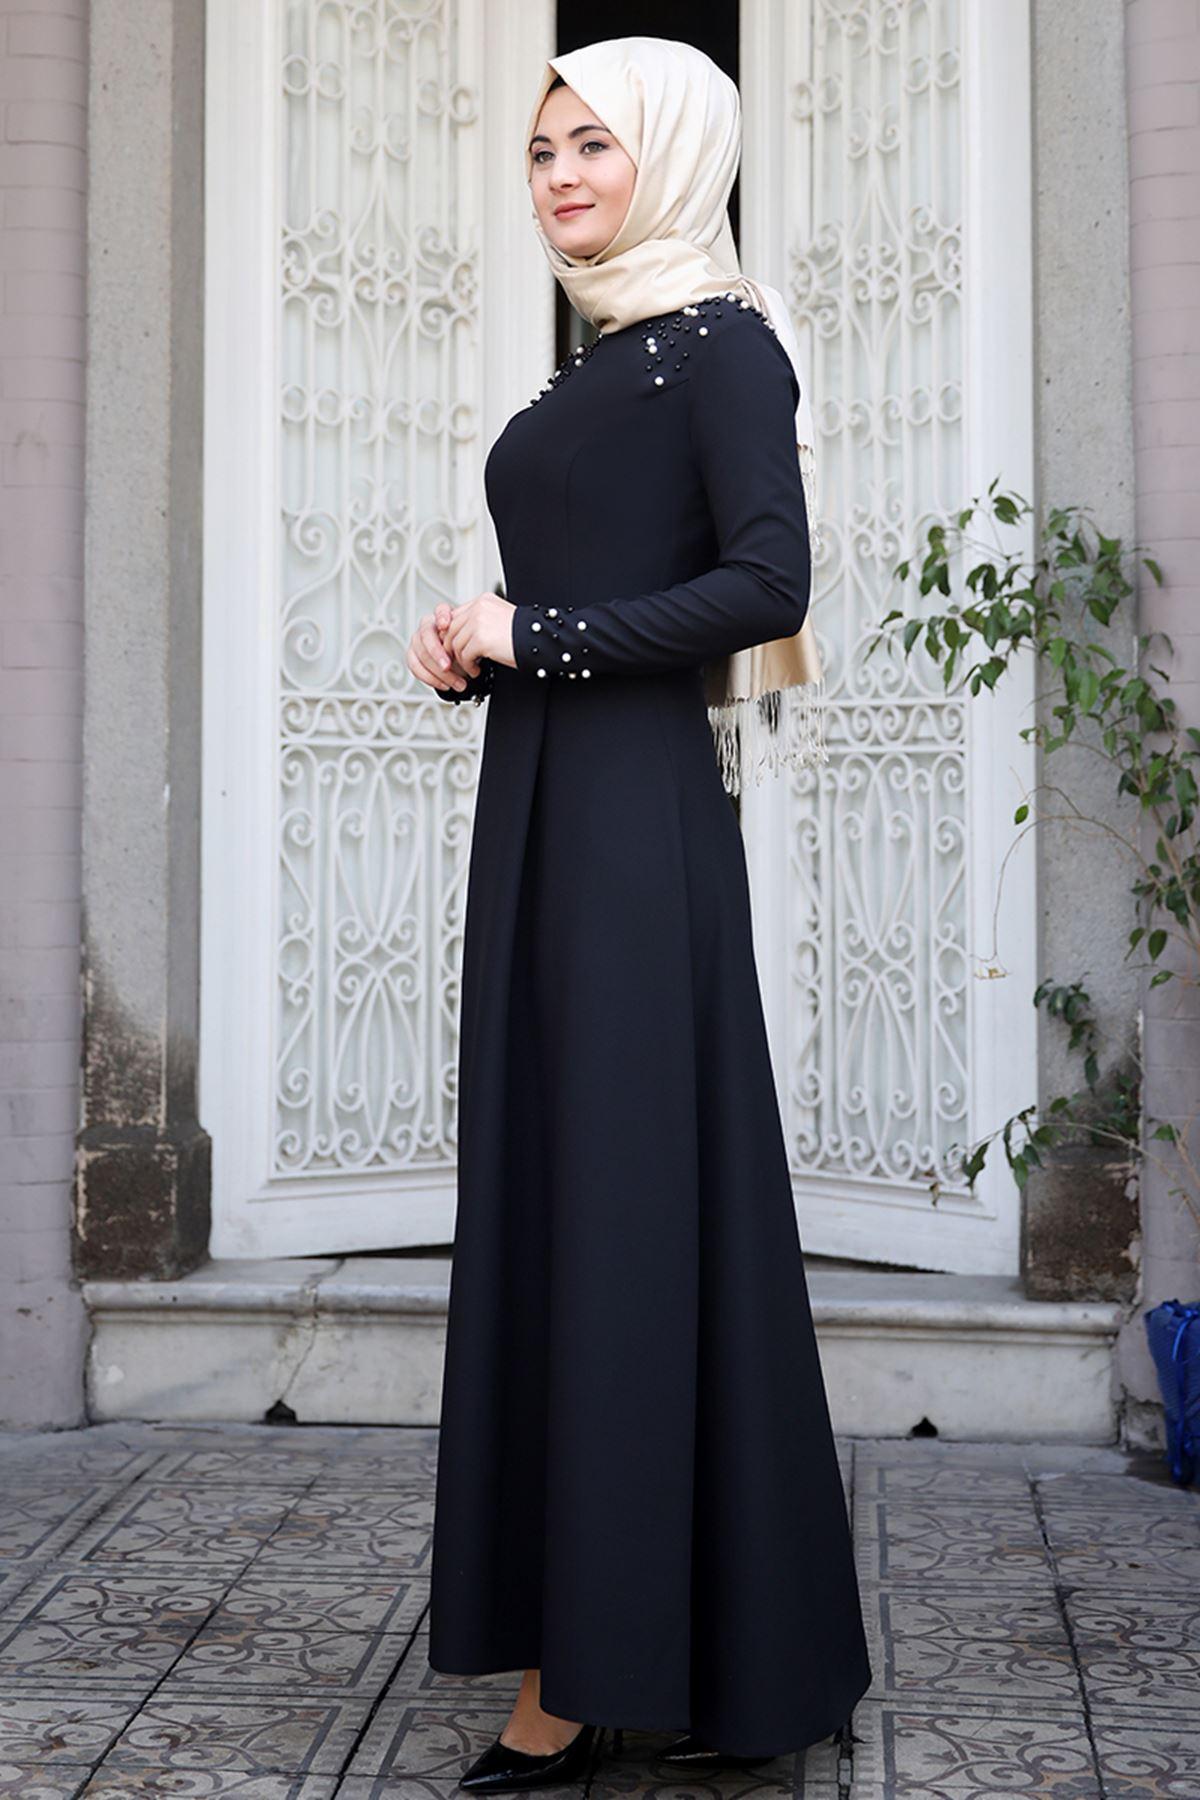 Sümay Omuz Taşlı Elbise Siyah